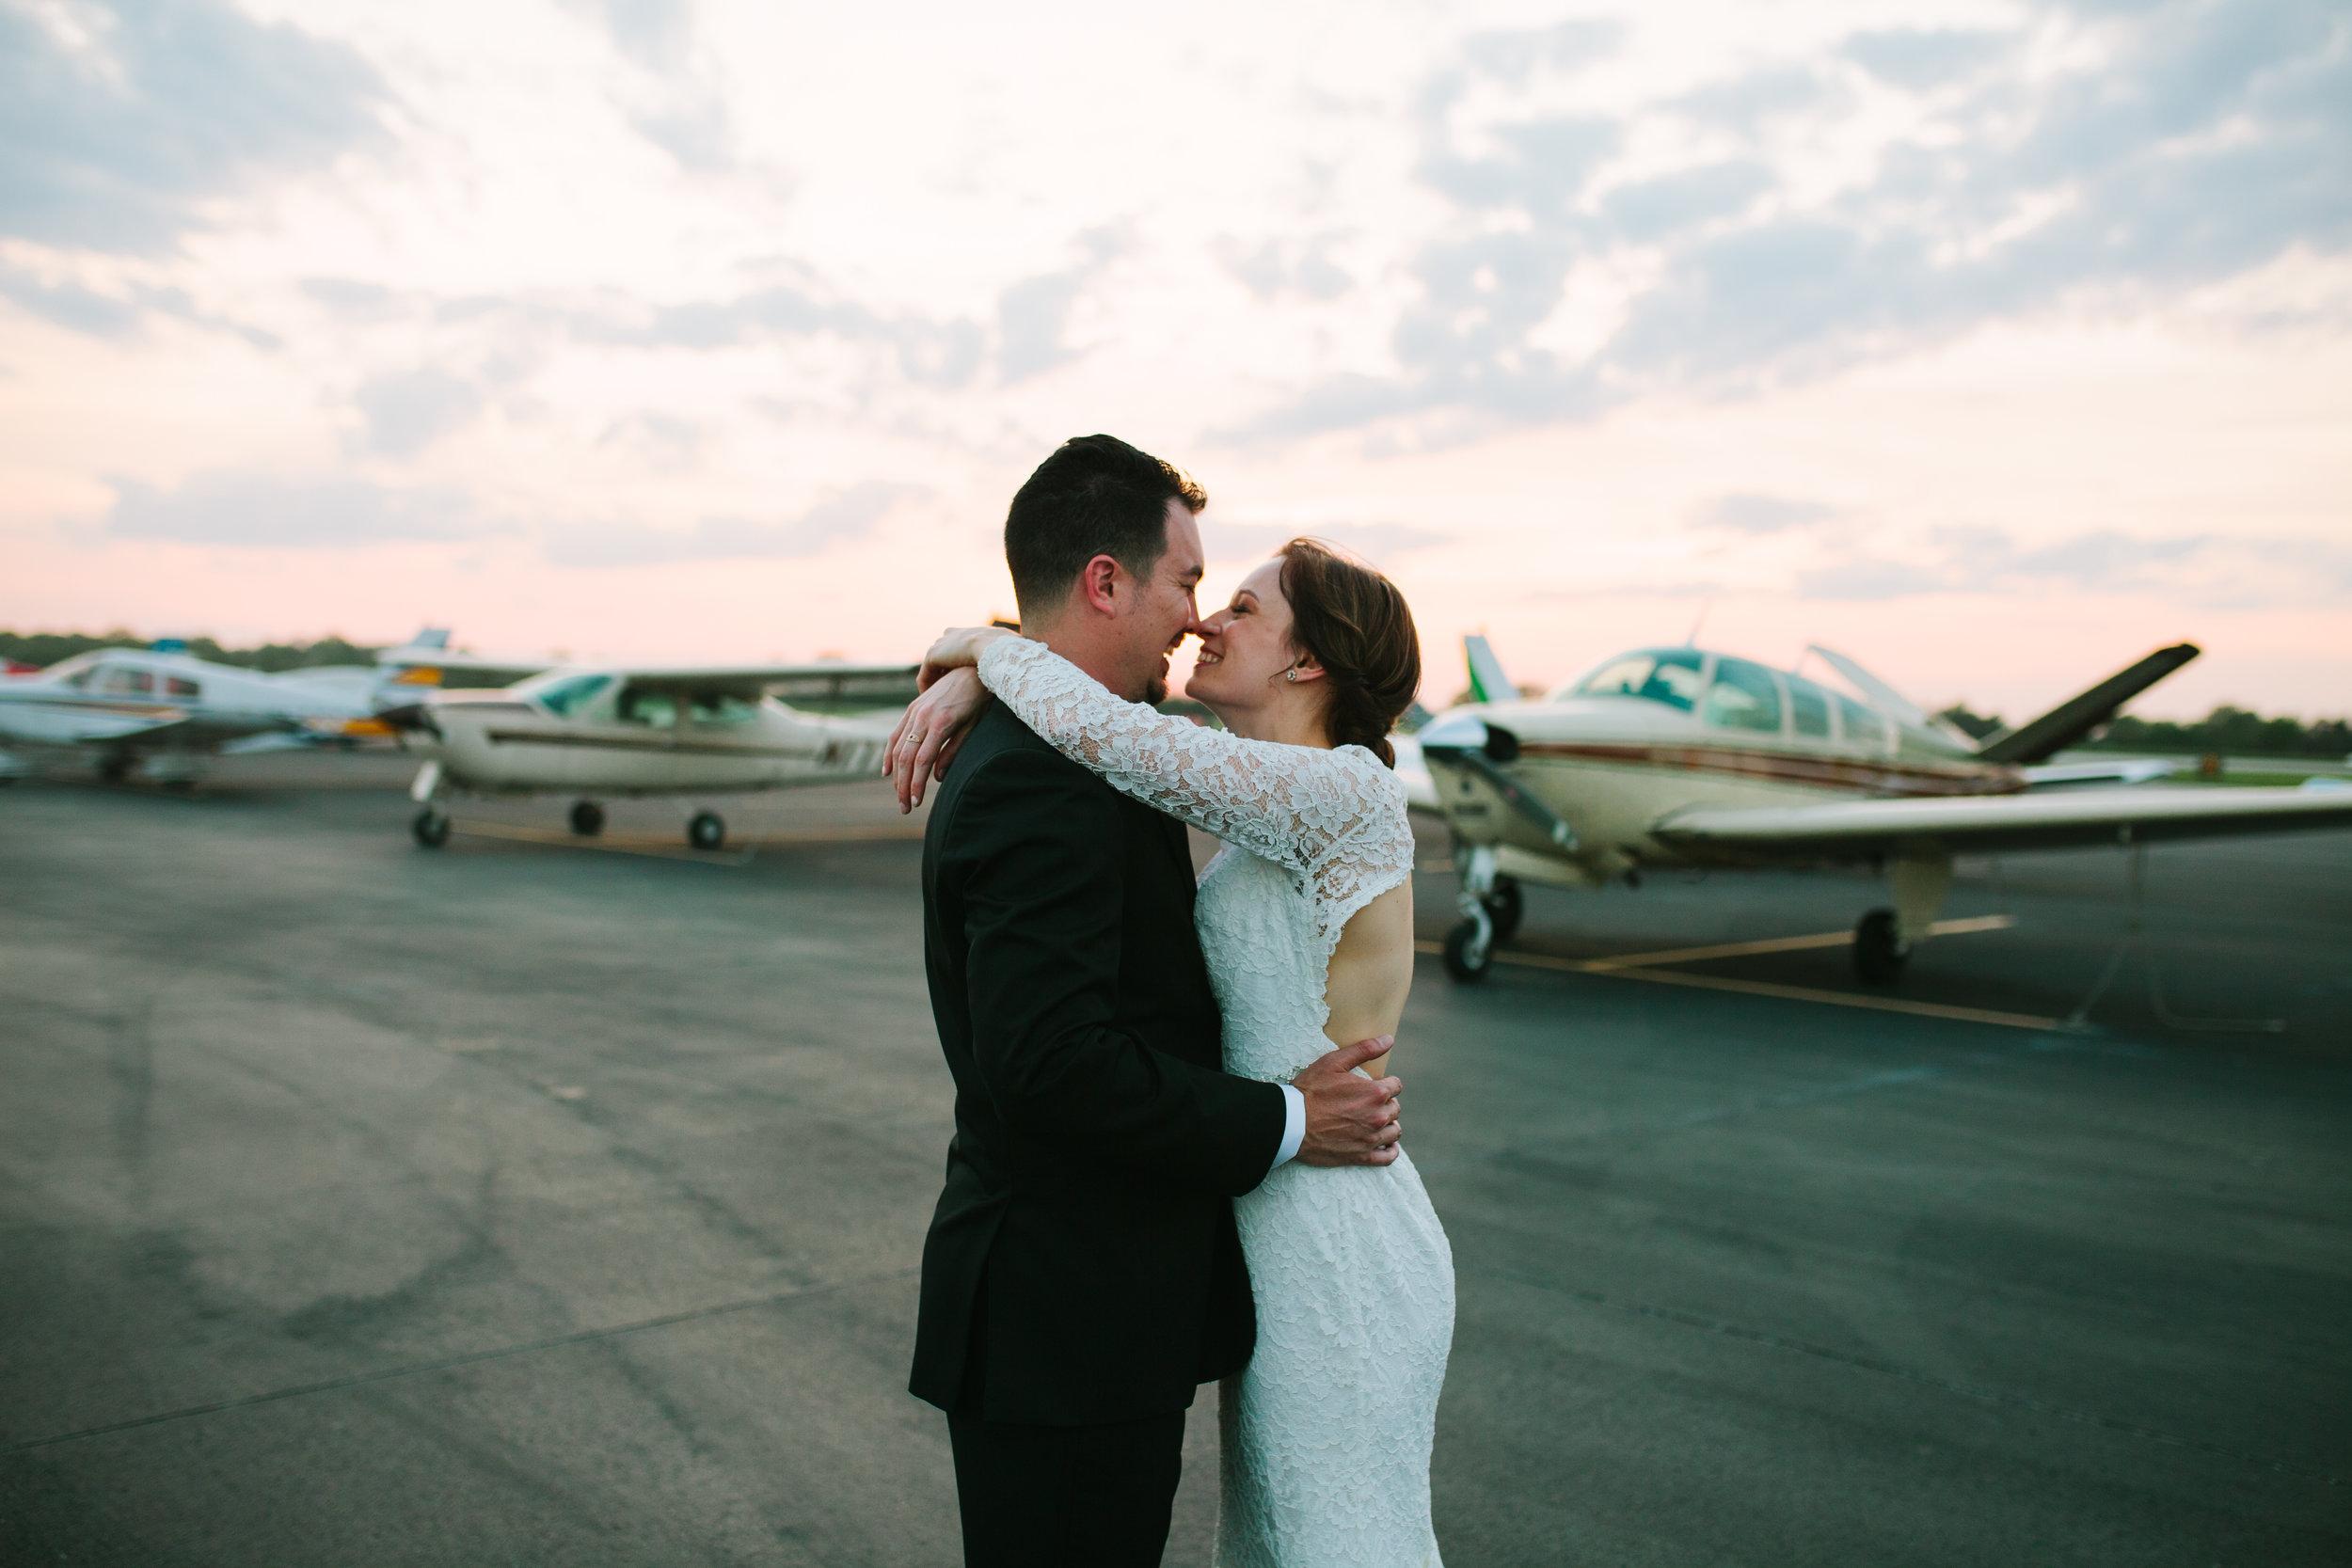 nashville.tennessee.wedding.photographer-3.jpg